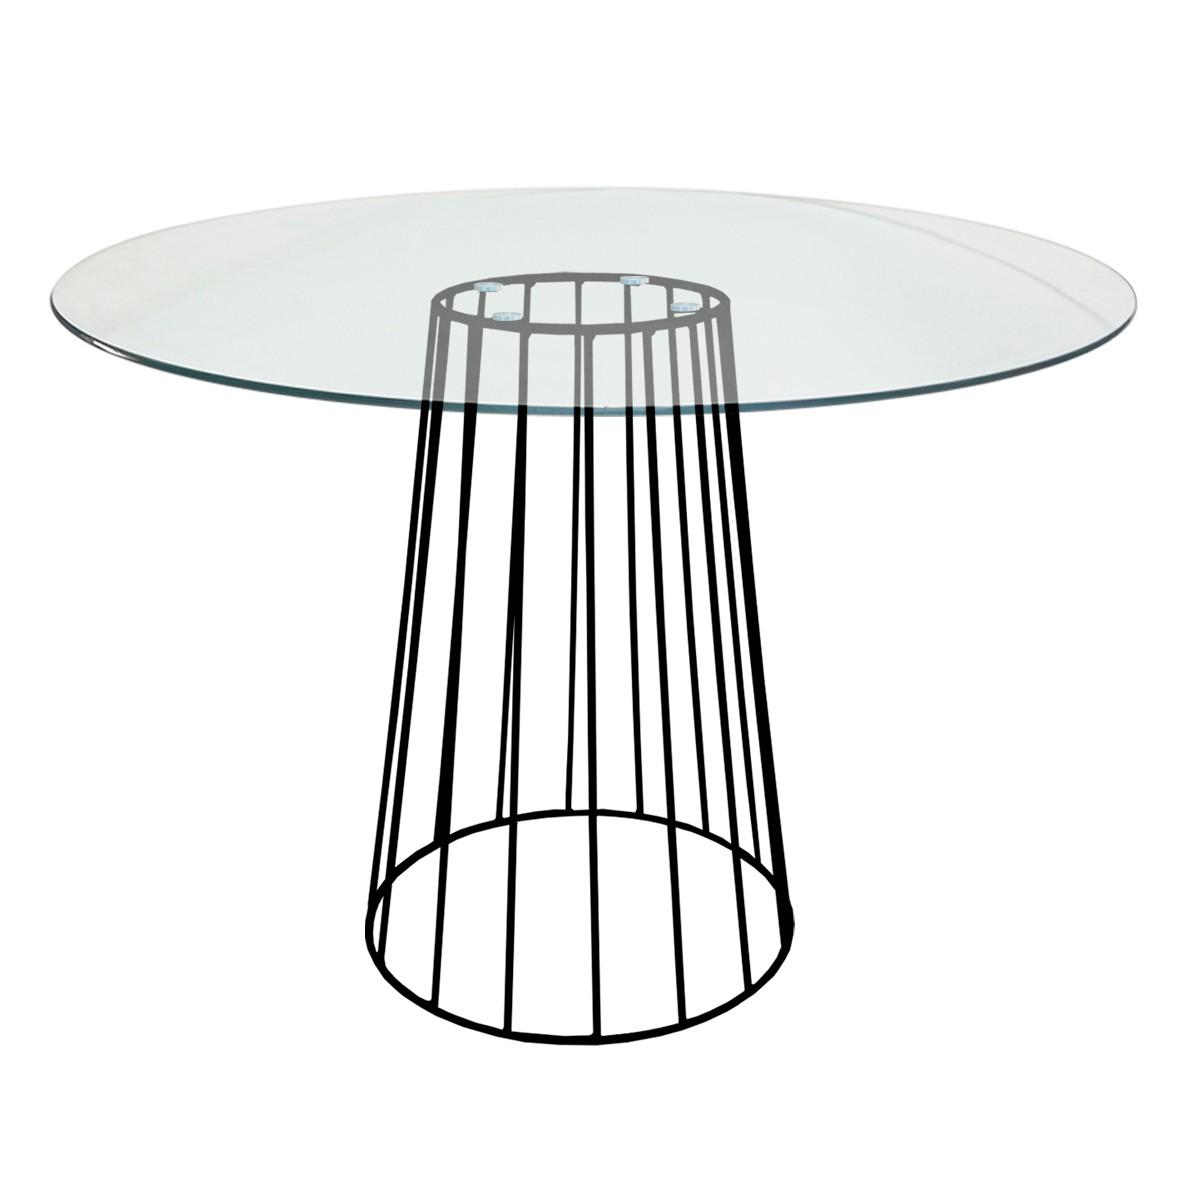 Mesa de Jantar cone Redonda Raiada com Tampo de Vidro Temperado 8mm